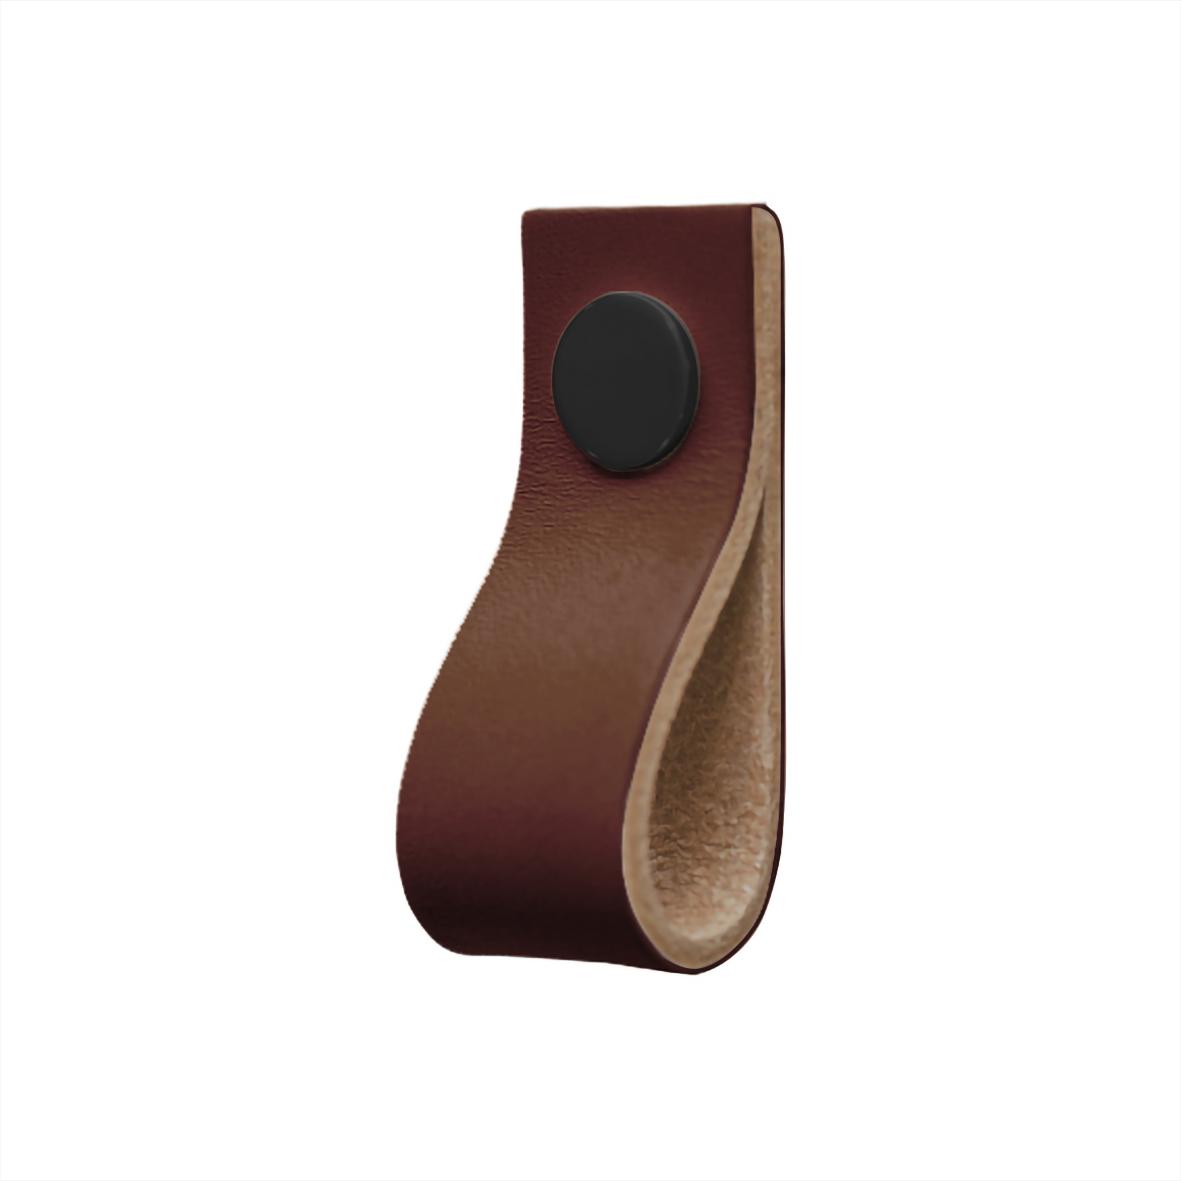 "Läderloop Brun & Svart Läder knopp (""Läderflärp"")"